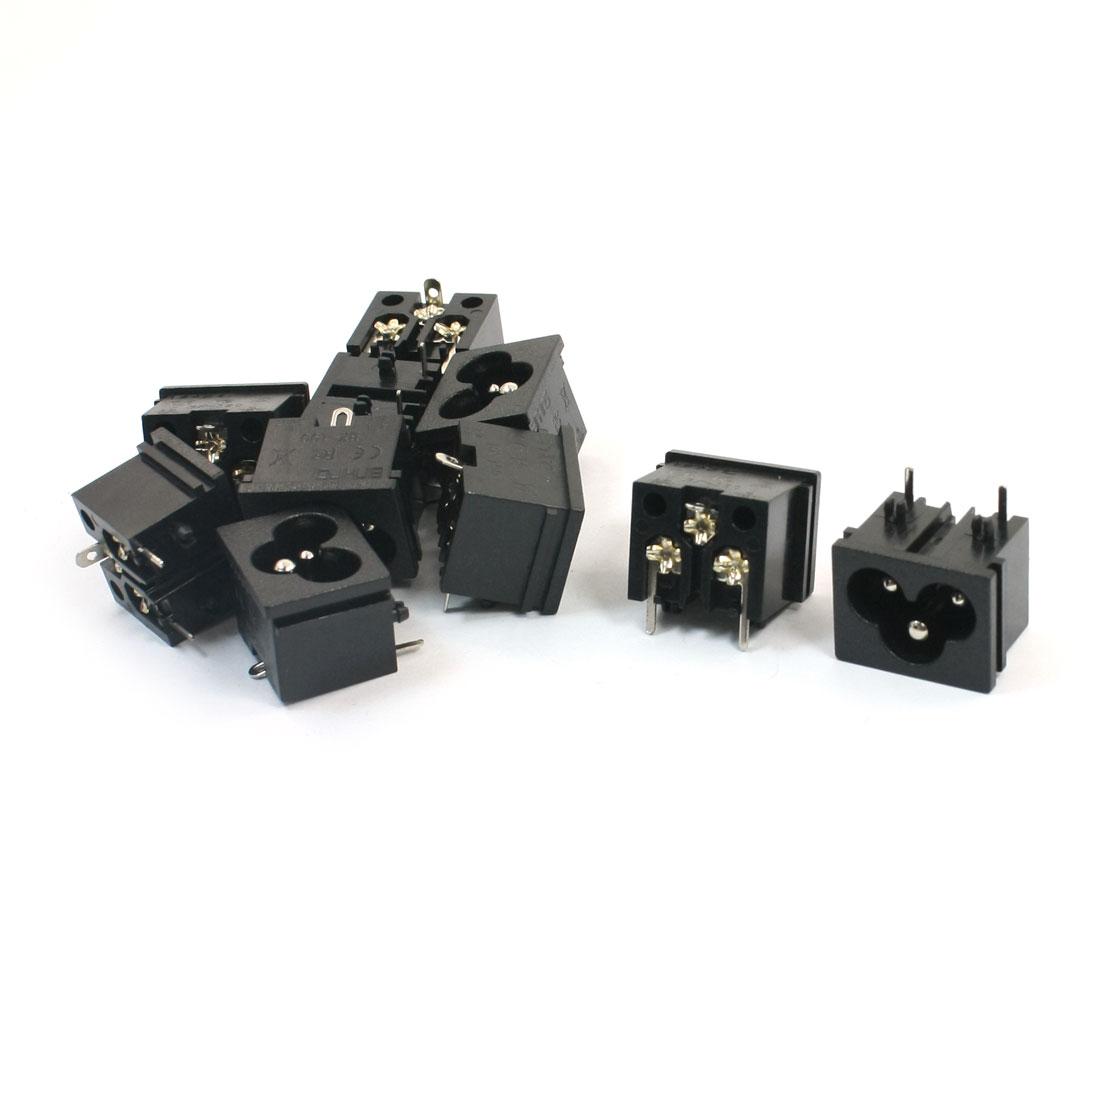 AC 125V 7A IEC320 C8 Socket Power Supply Adapter Converter 10Pcs